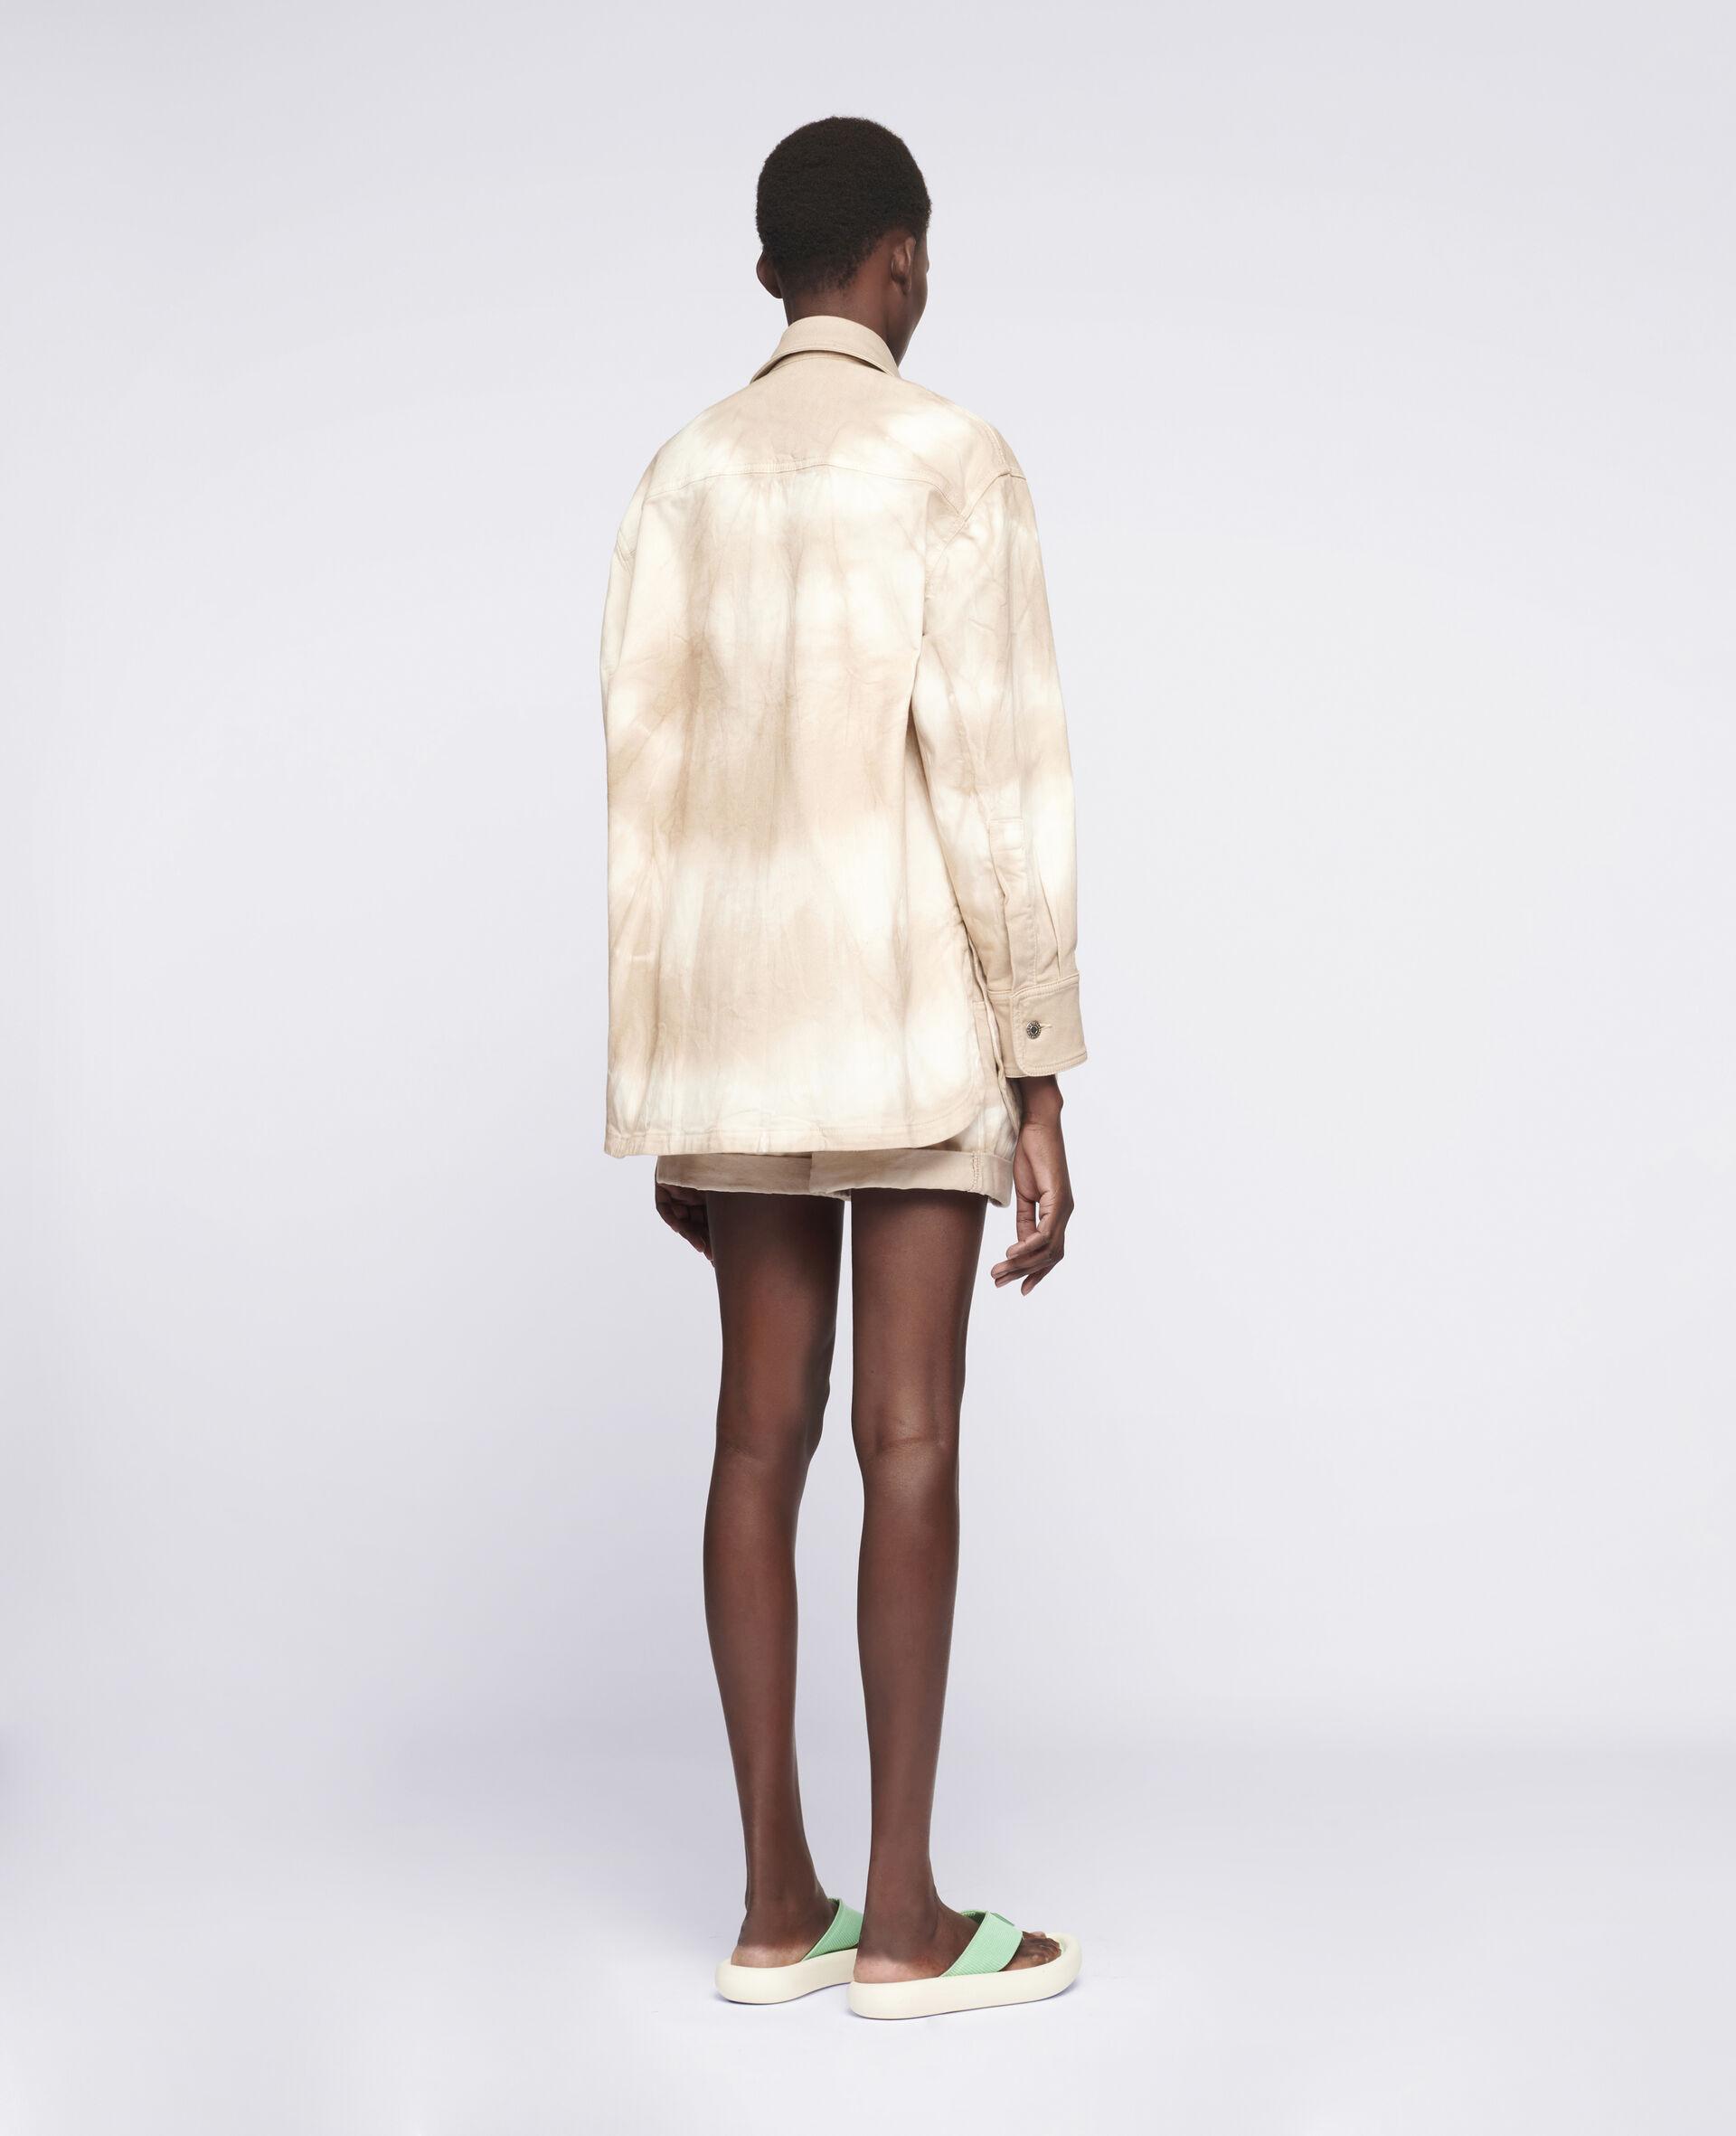 DenimhJeansJeansemd im Batik-Style-Beige-large image number 2